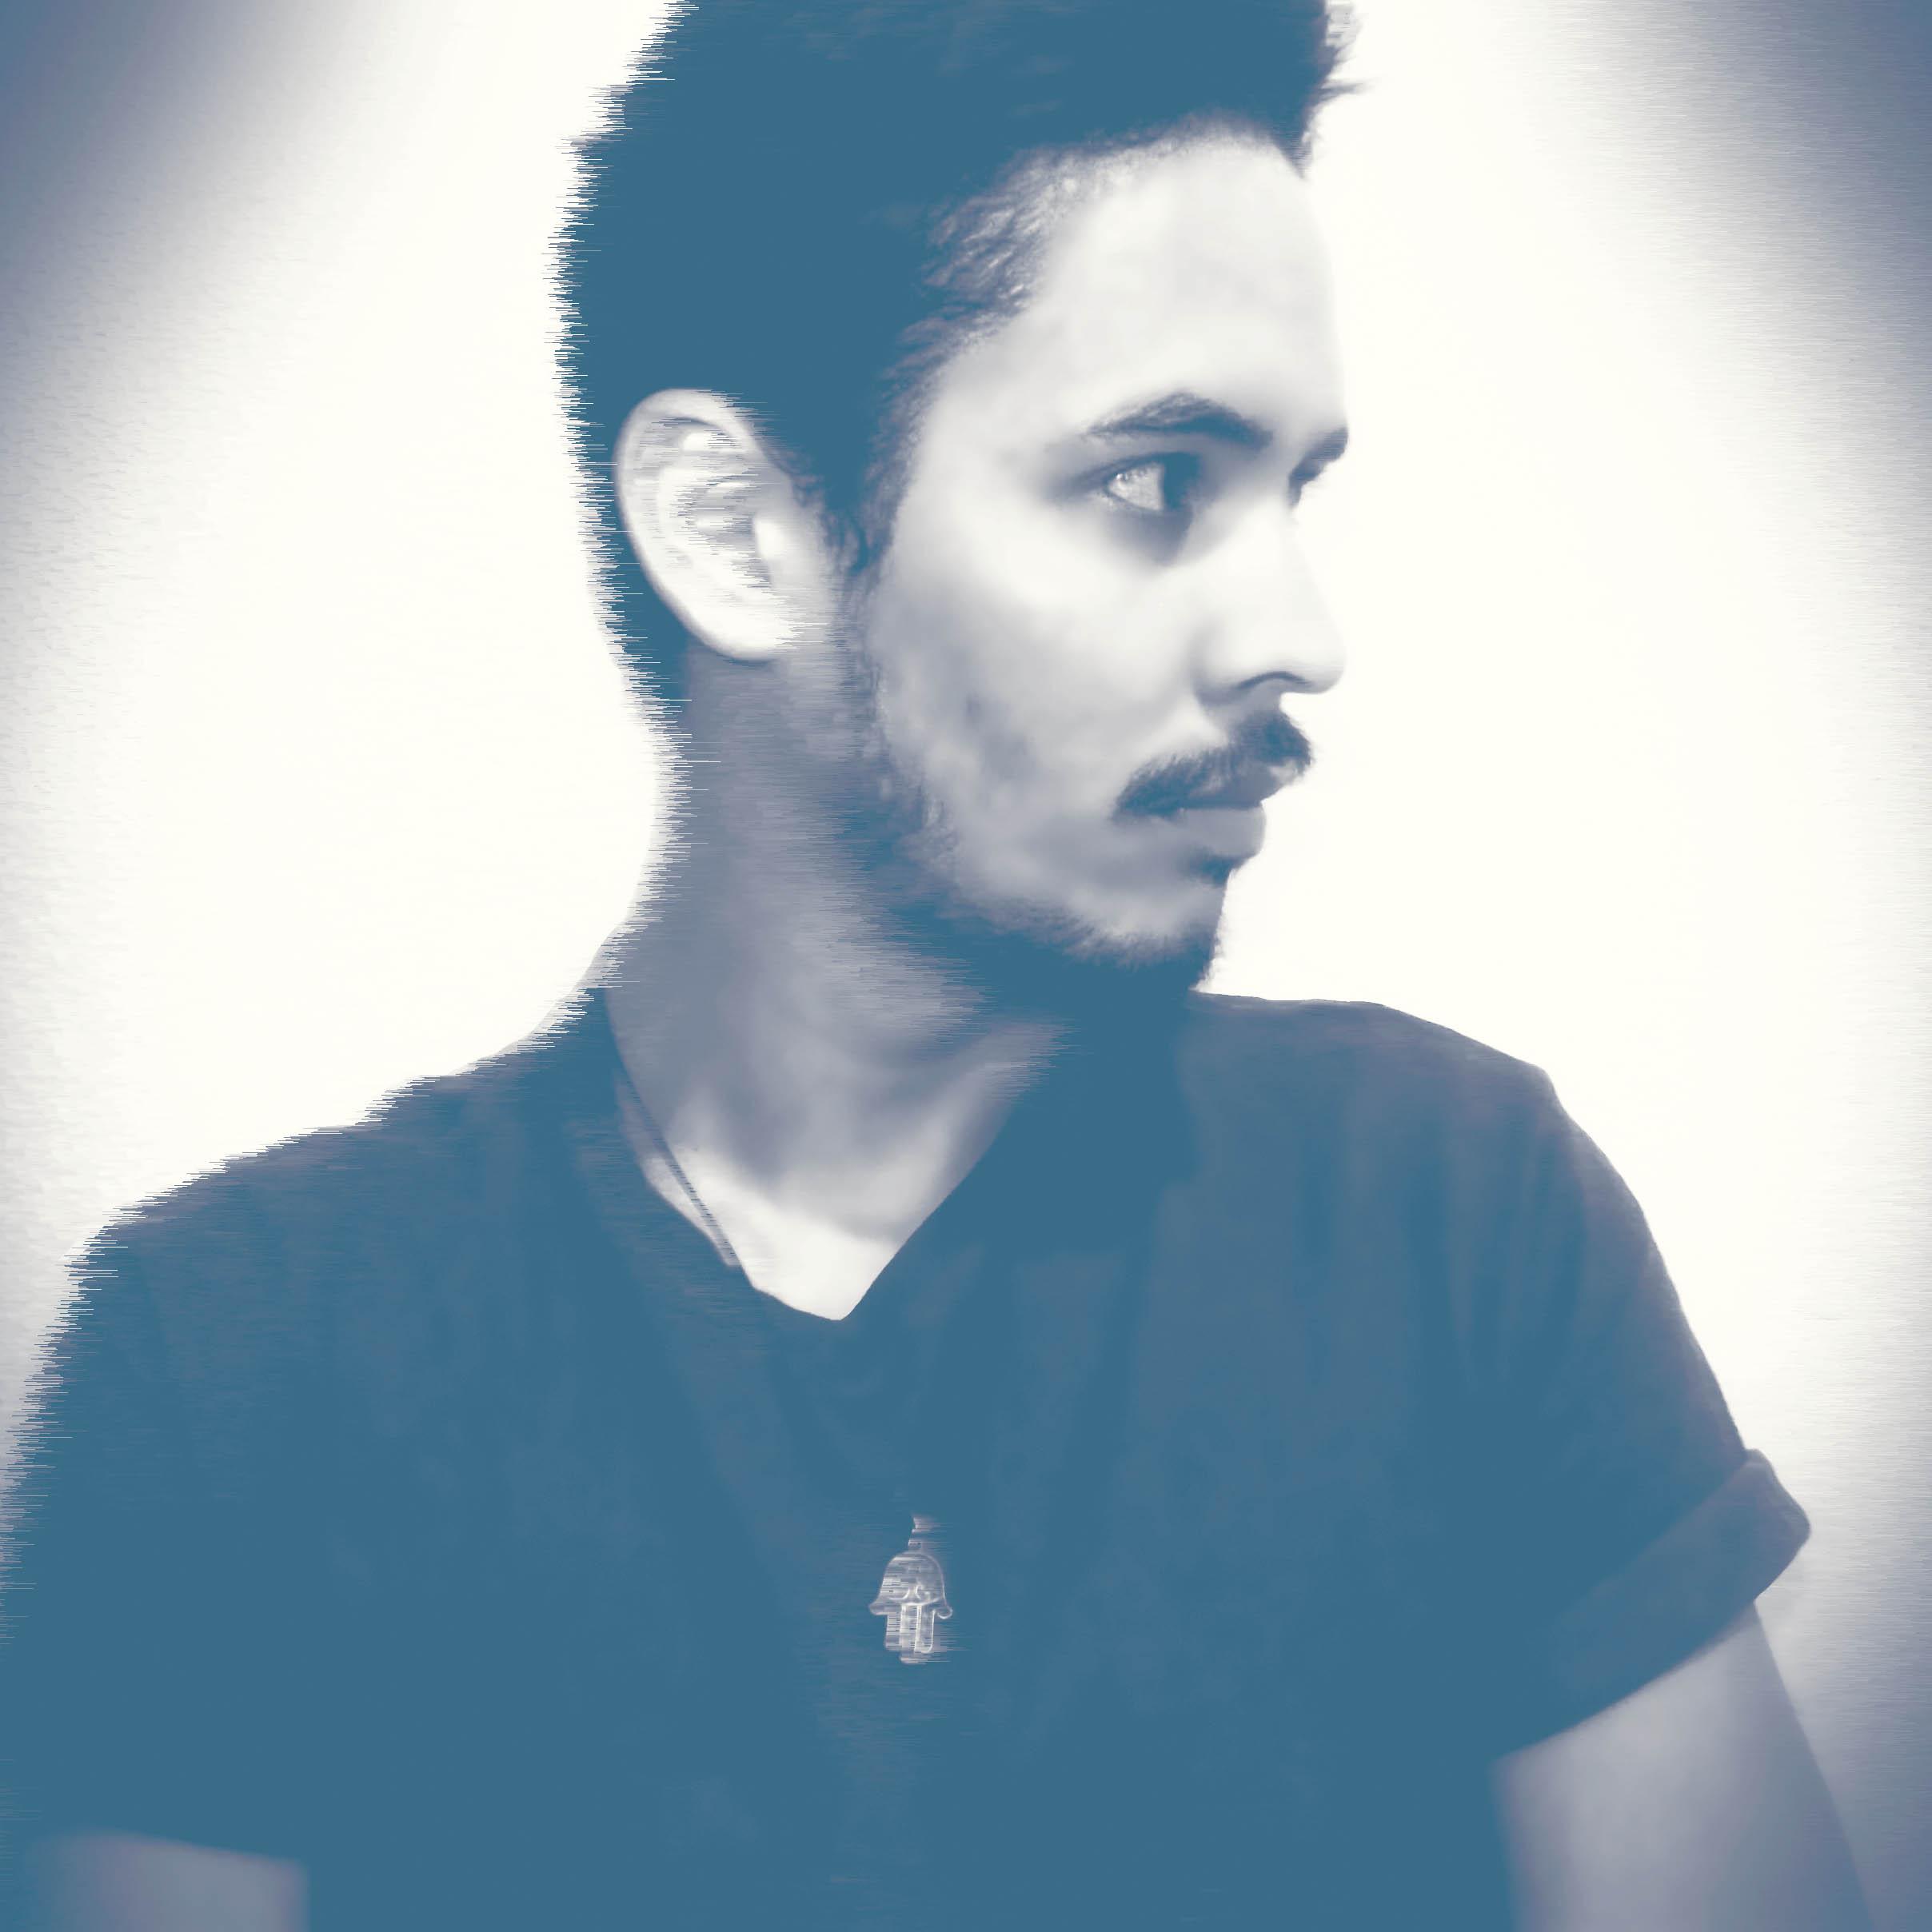 DOGCAST 005 Artist: YAN NIKLAS Genre: Techno Country: Brazil